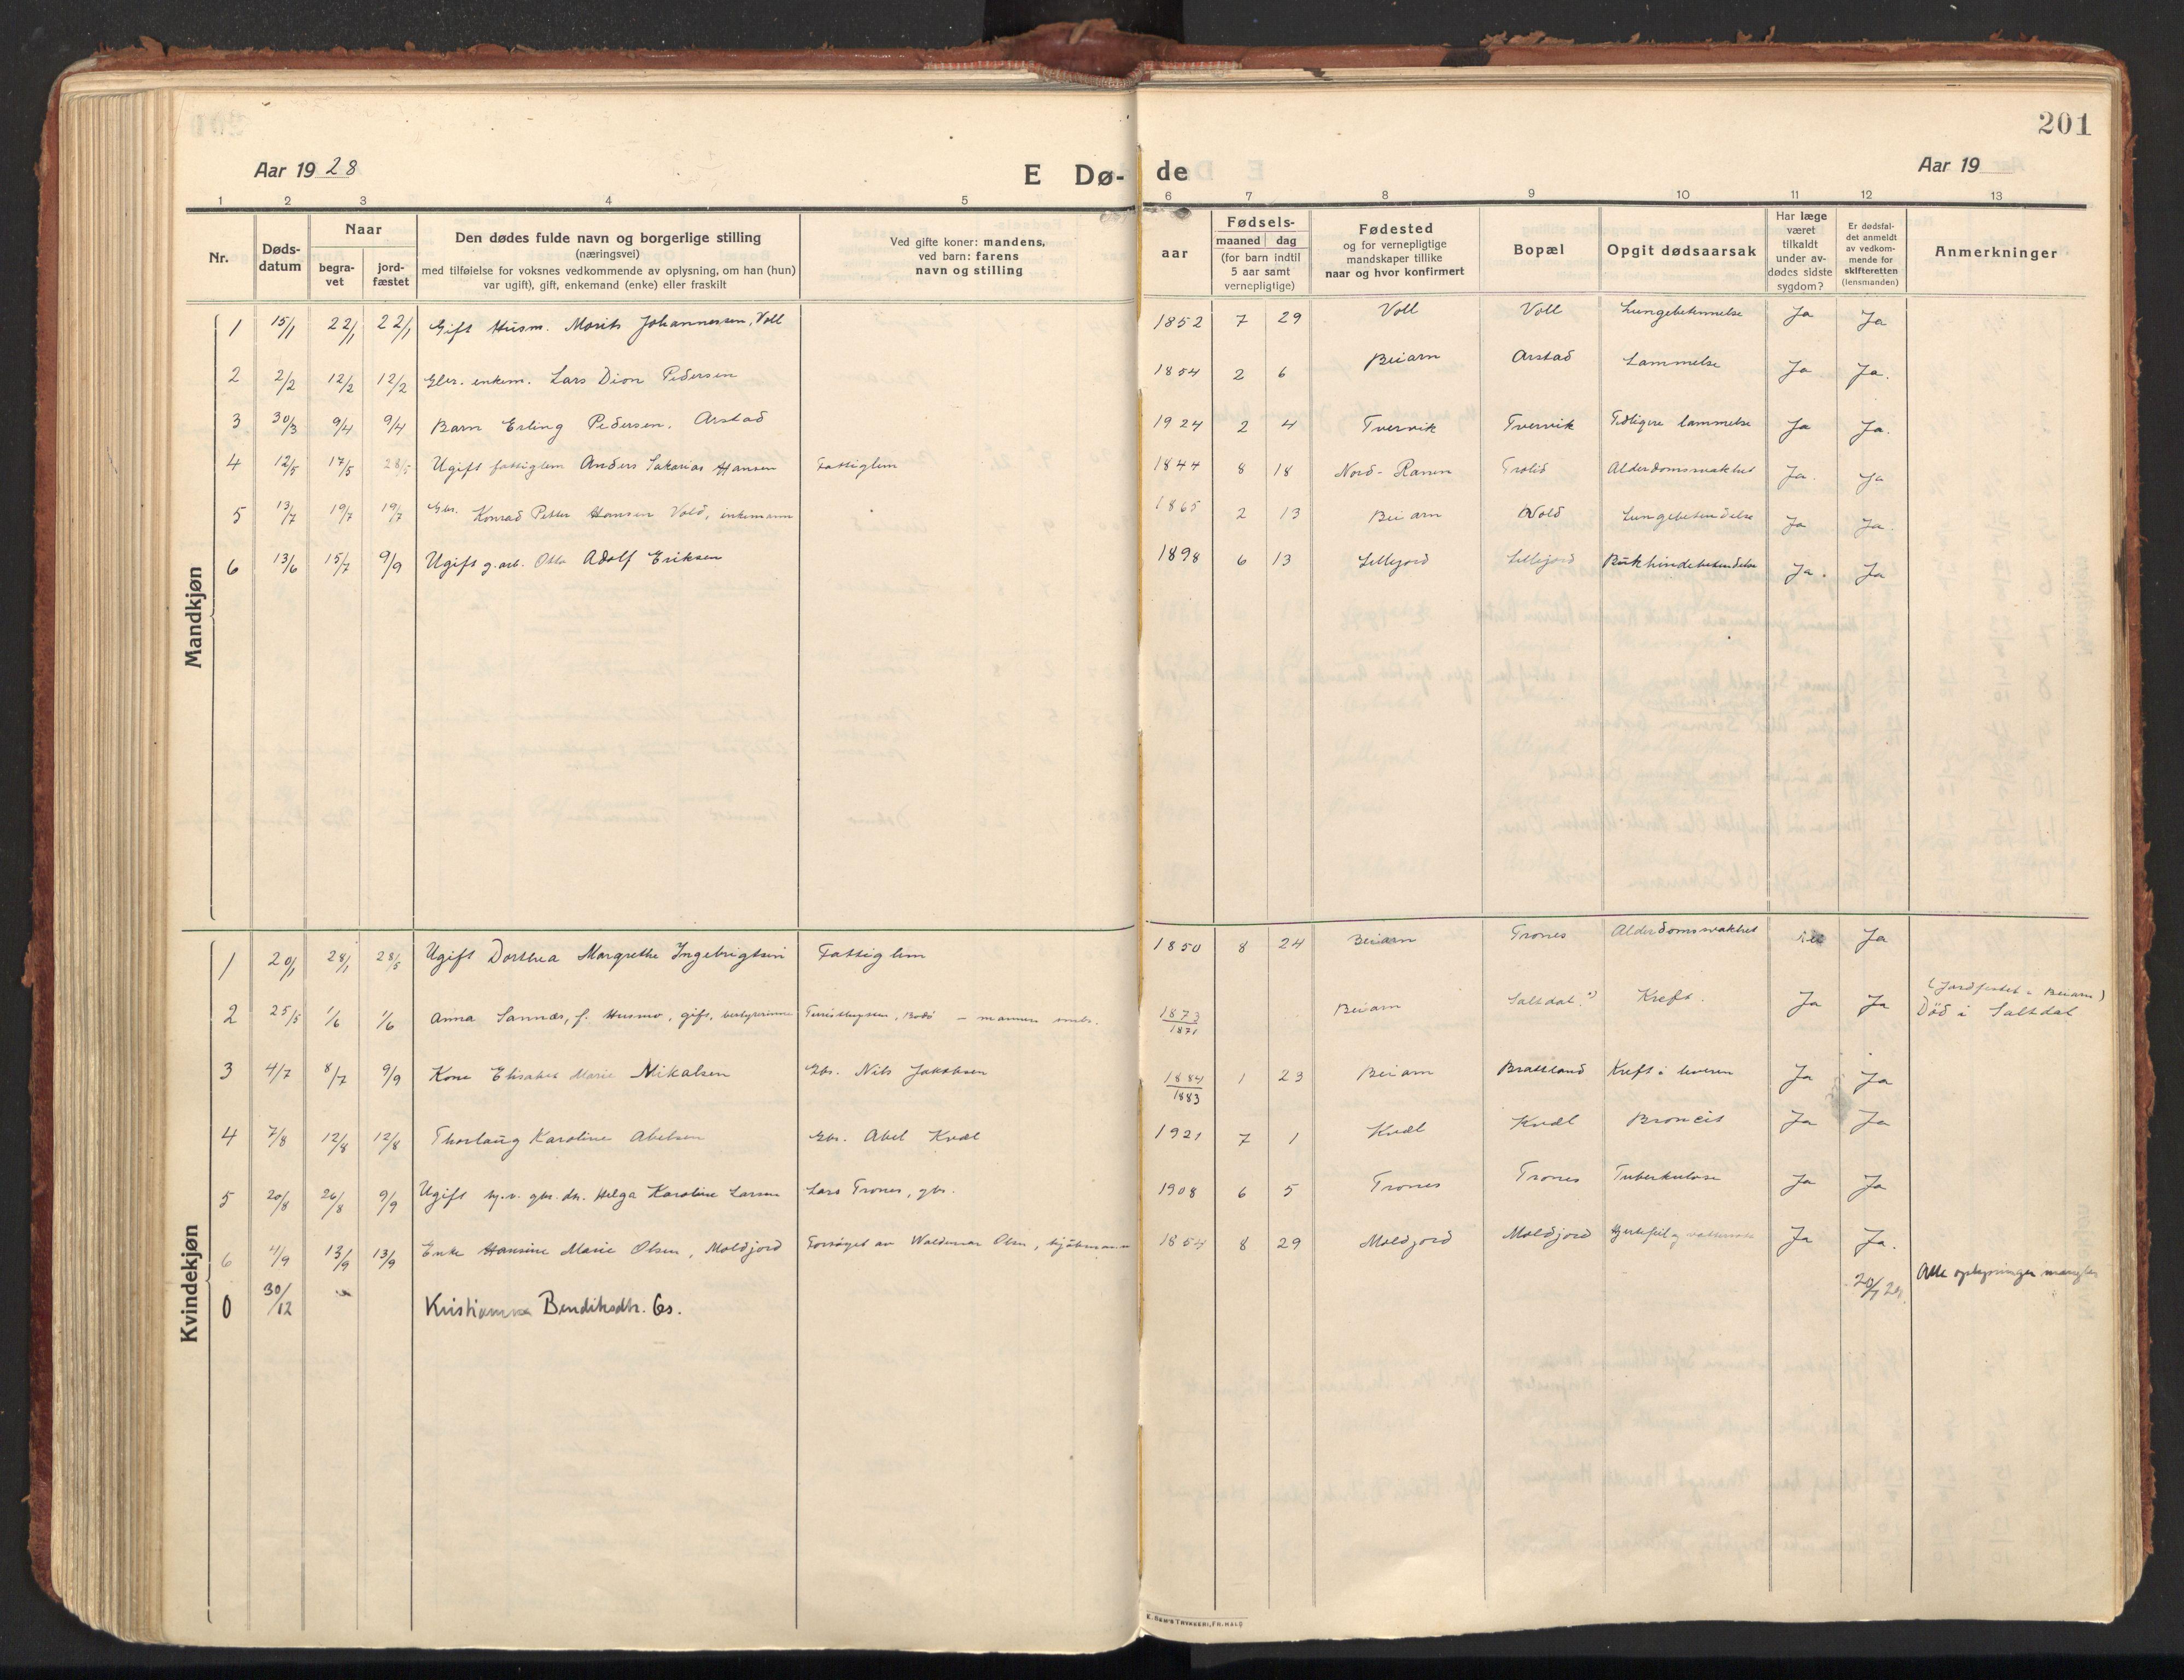 SAT, Ministerialprotokoller, klokkerbøker og fødselsregistre - Nordland, 846/L0650: Ministerialbok nr. 846A08, 1916-1935, s. 201